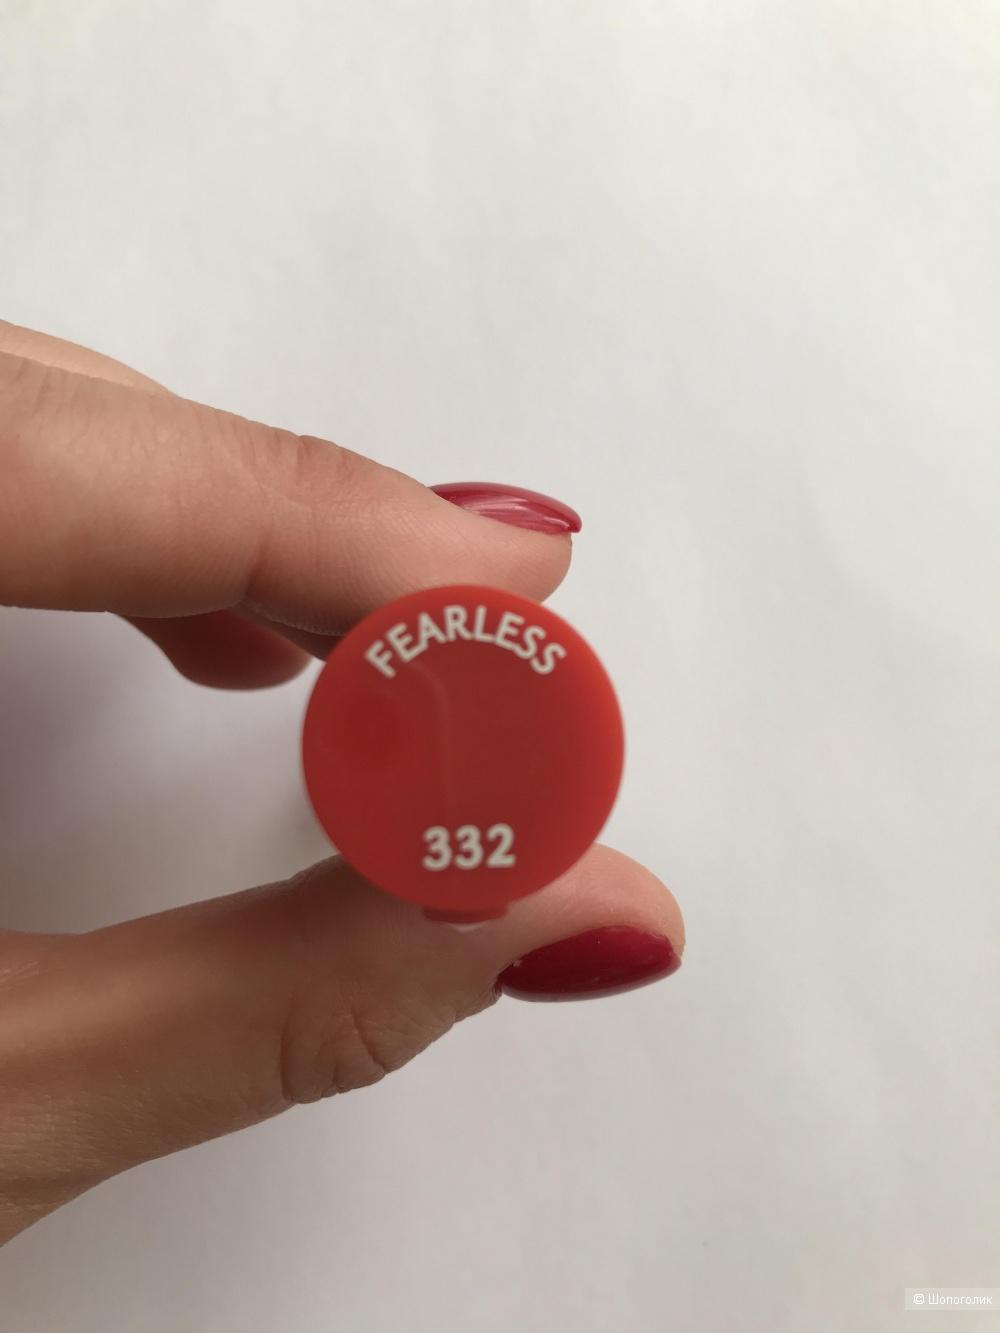 Givenchy Le Rouge Губная Бархатистая Помада, тон 332.